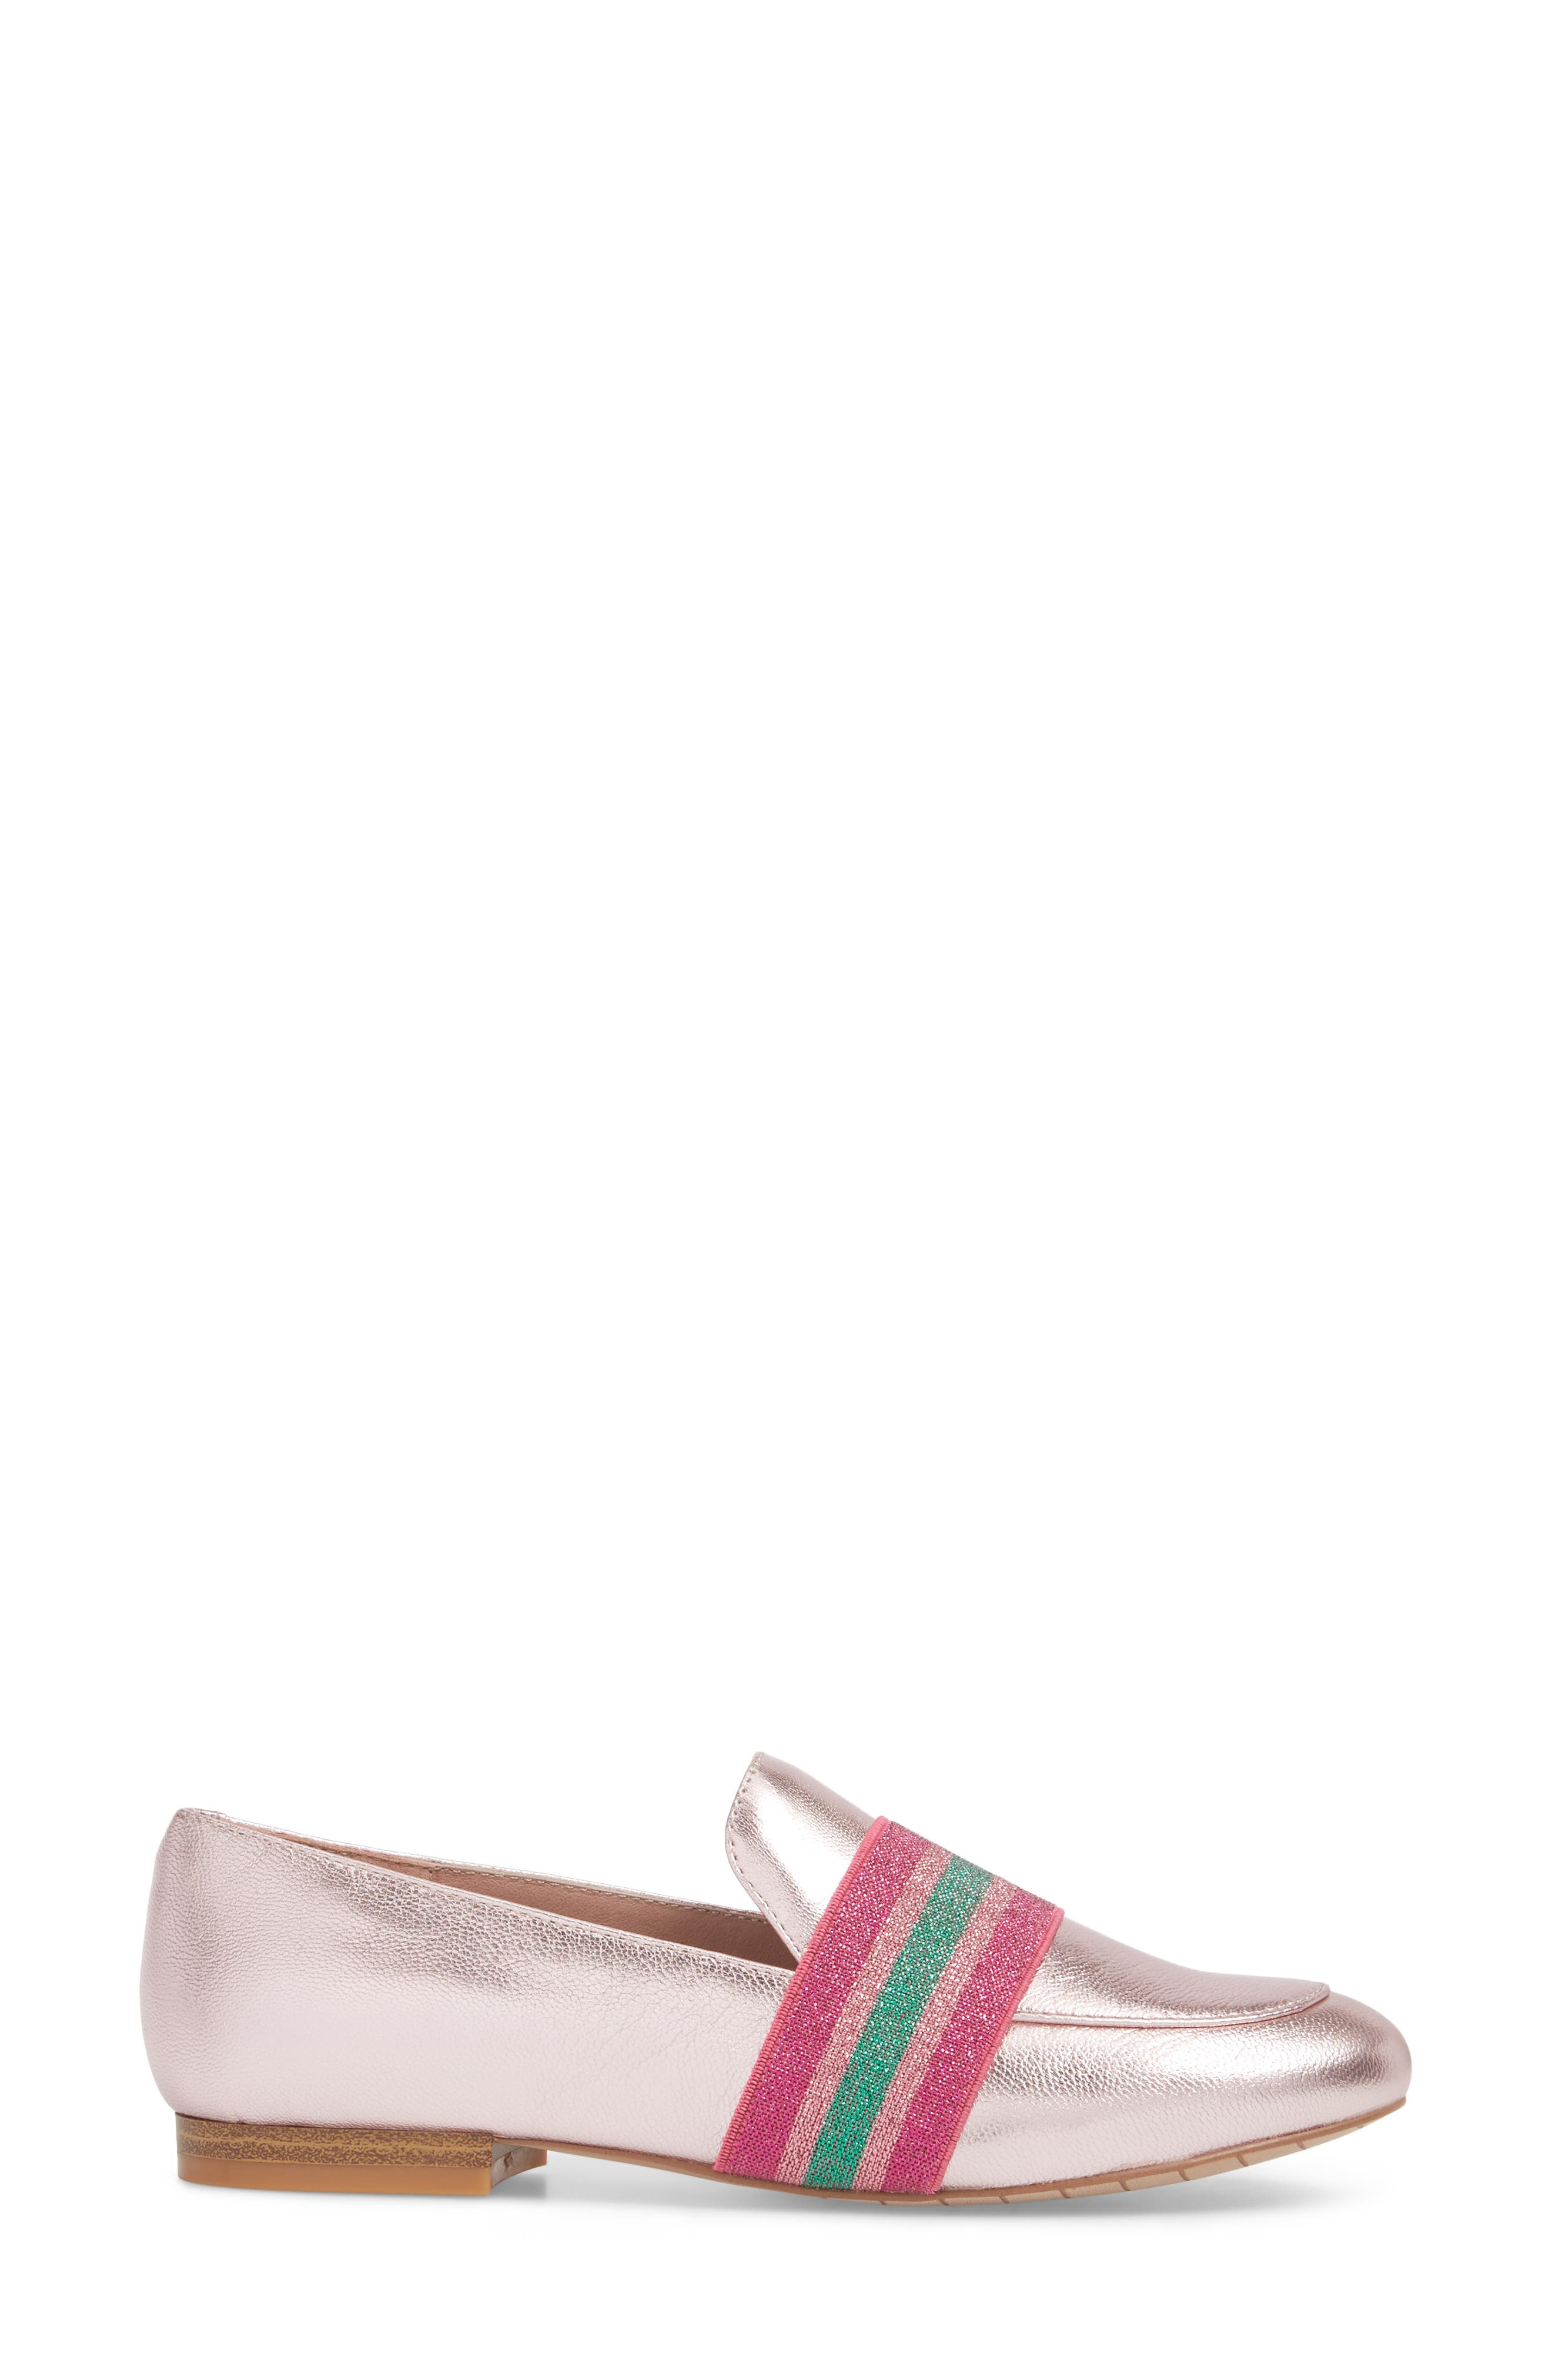 Walden Loafer,                             Alternate thumbnail 3, color,                             Pink Metallic Leather